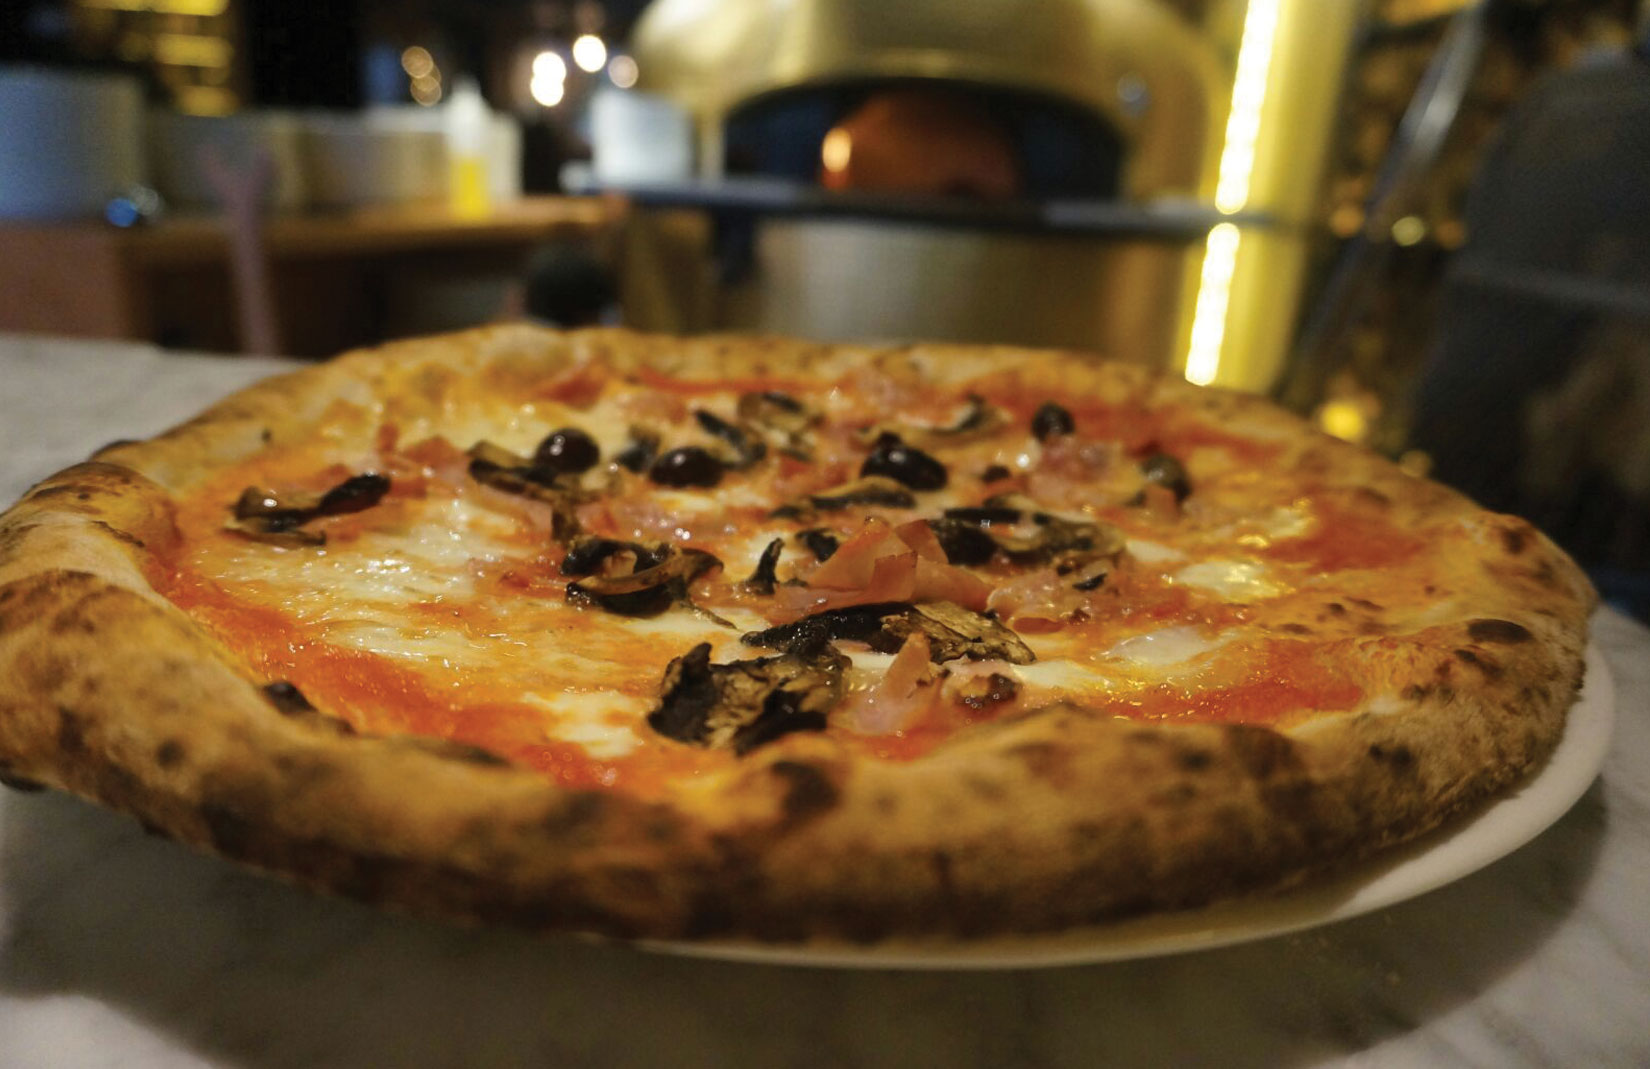 restaurante-italiano-pizzeria-barcelona-eixample-menus-de-grupo-y-diario